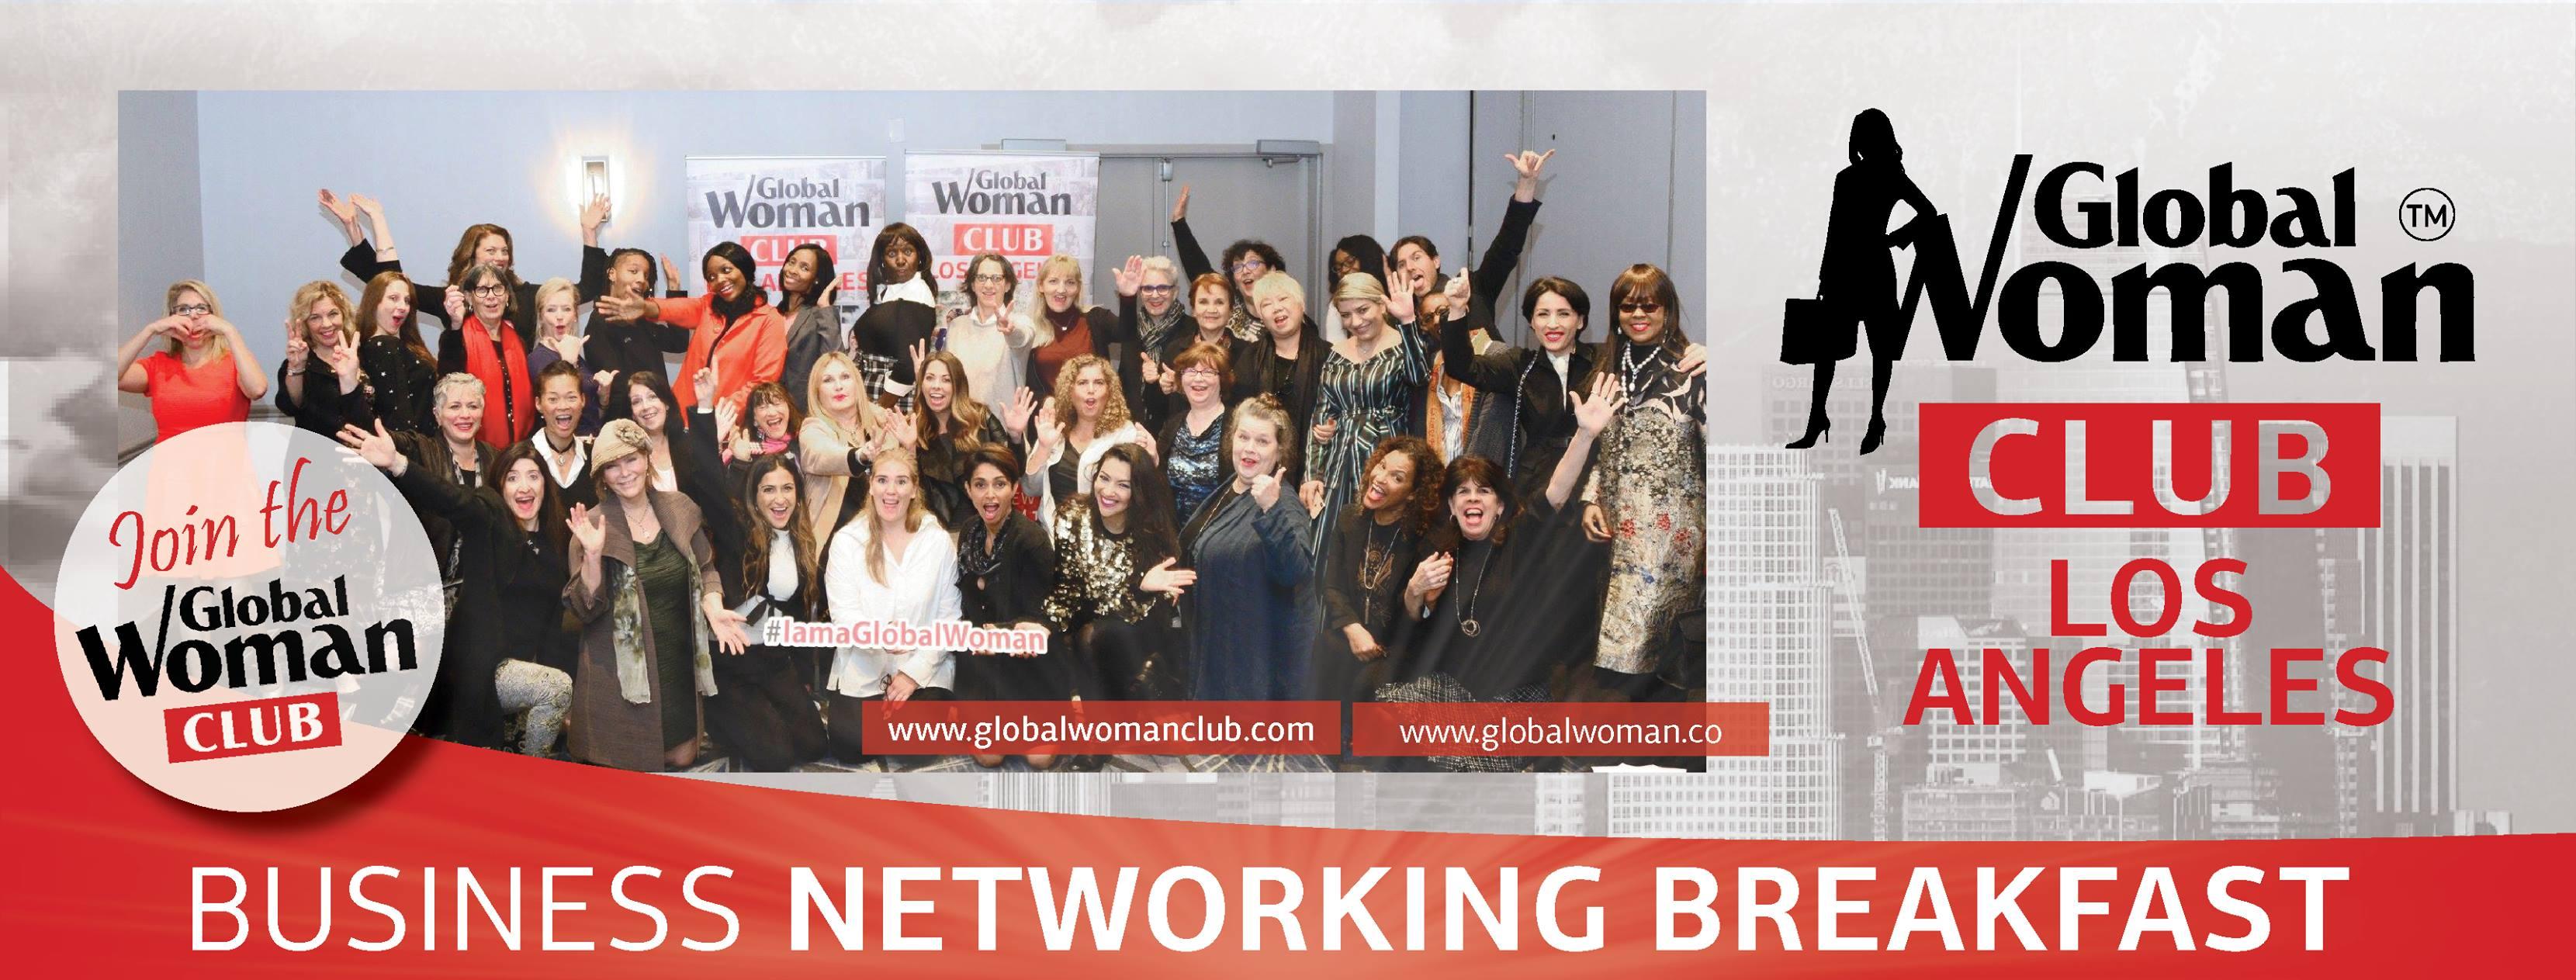 GLOBAL WOMAN CLUB Los Angeles : BUSINESS NETWORKING MEETING - June